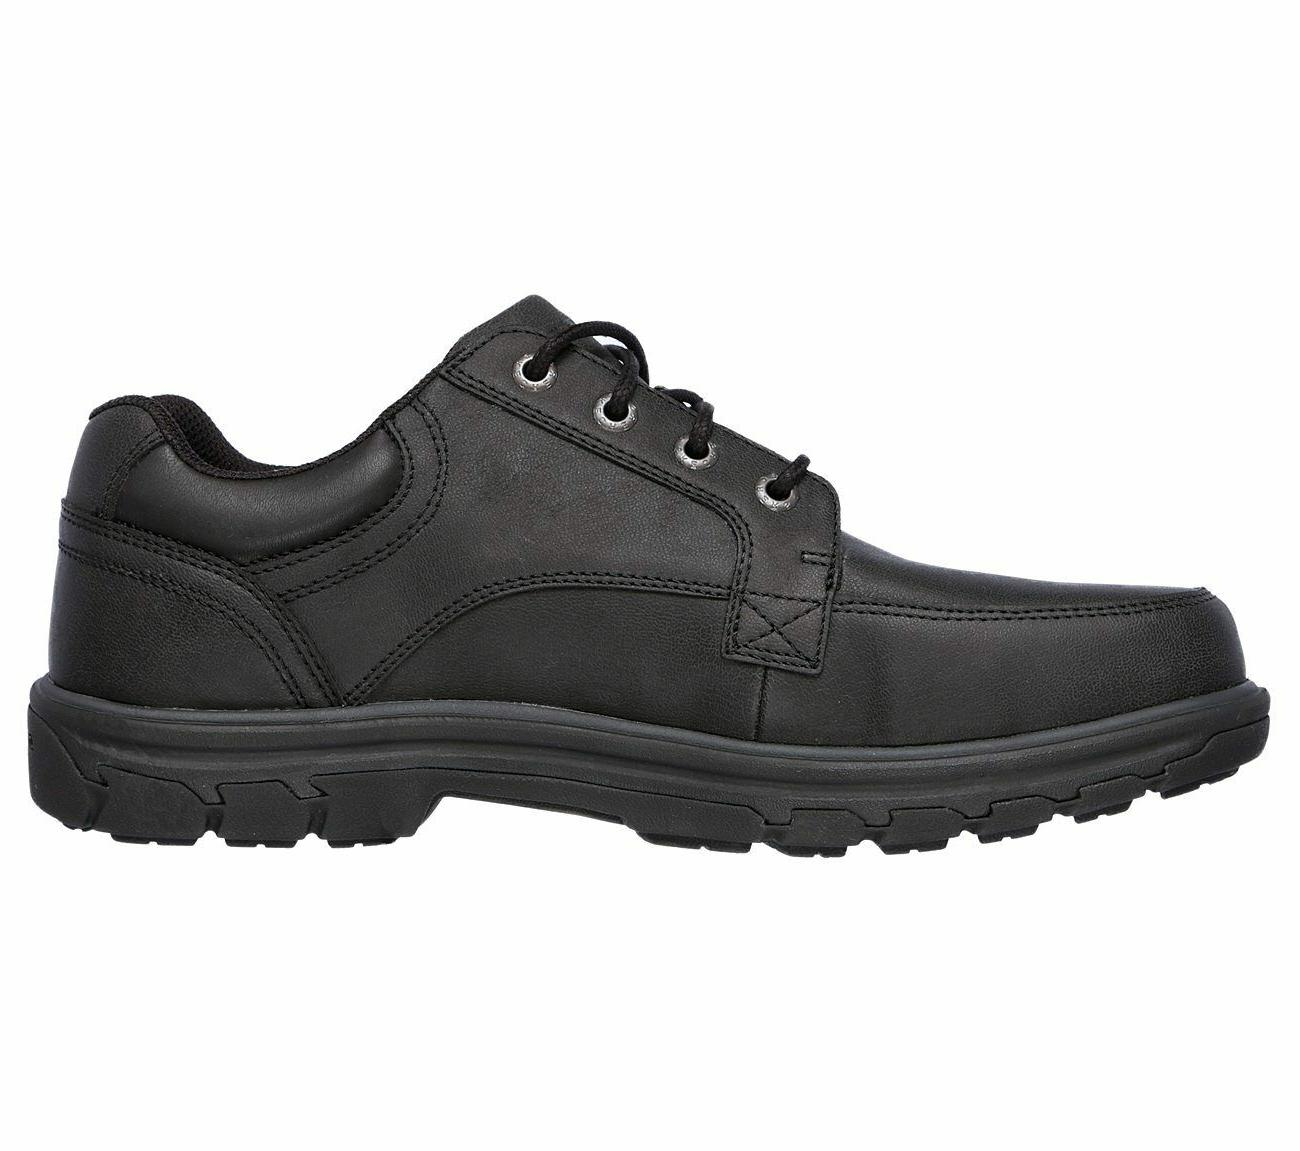 65567 Skechers Men Foam Comfort Casual lace up Oxford